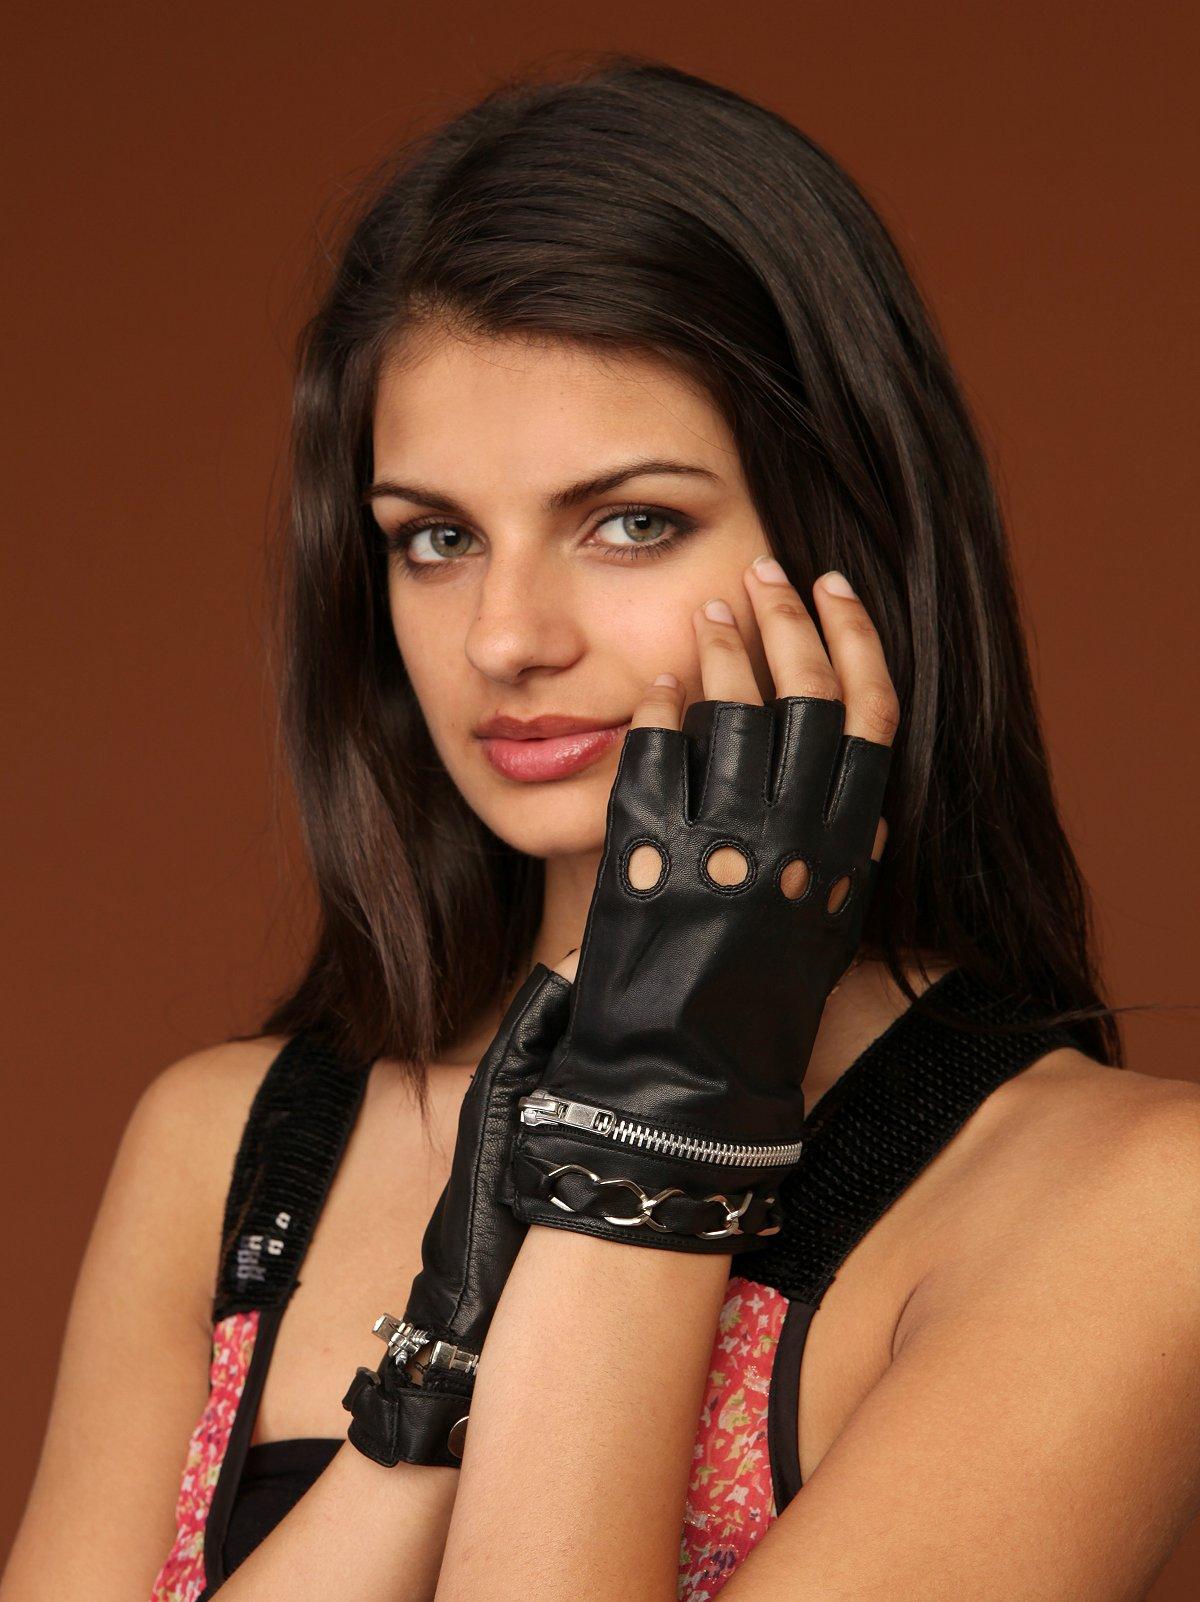 Chain Zip Fingerless Glove